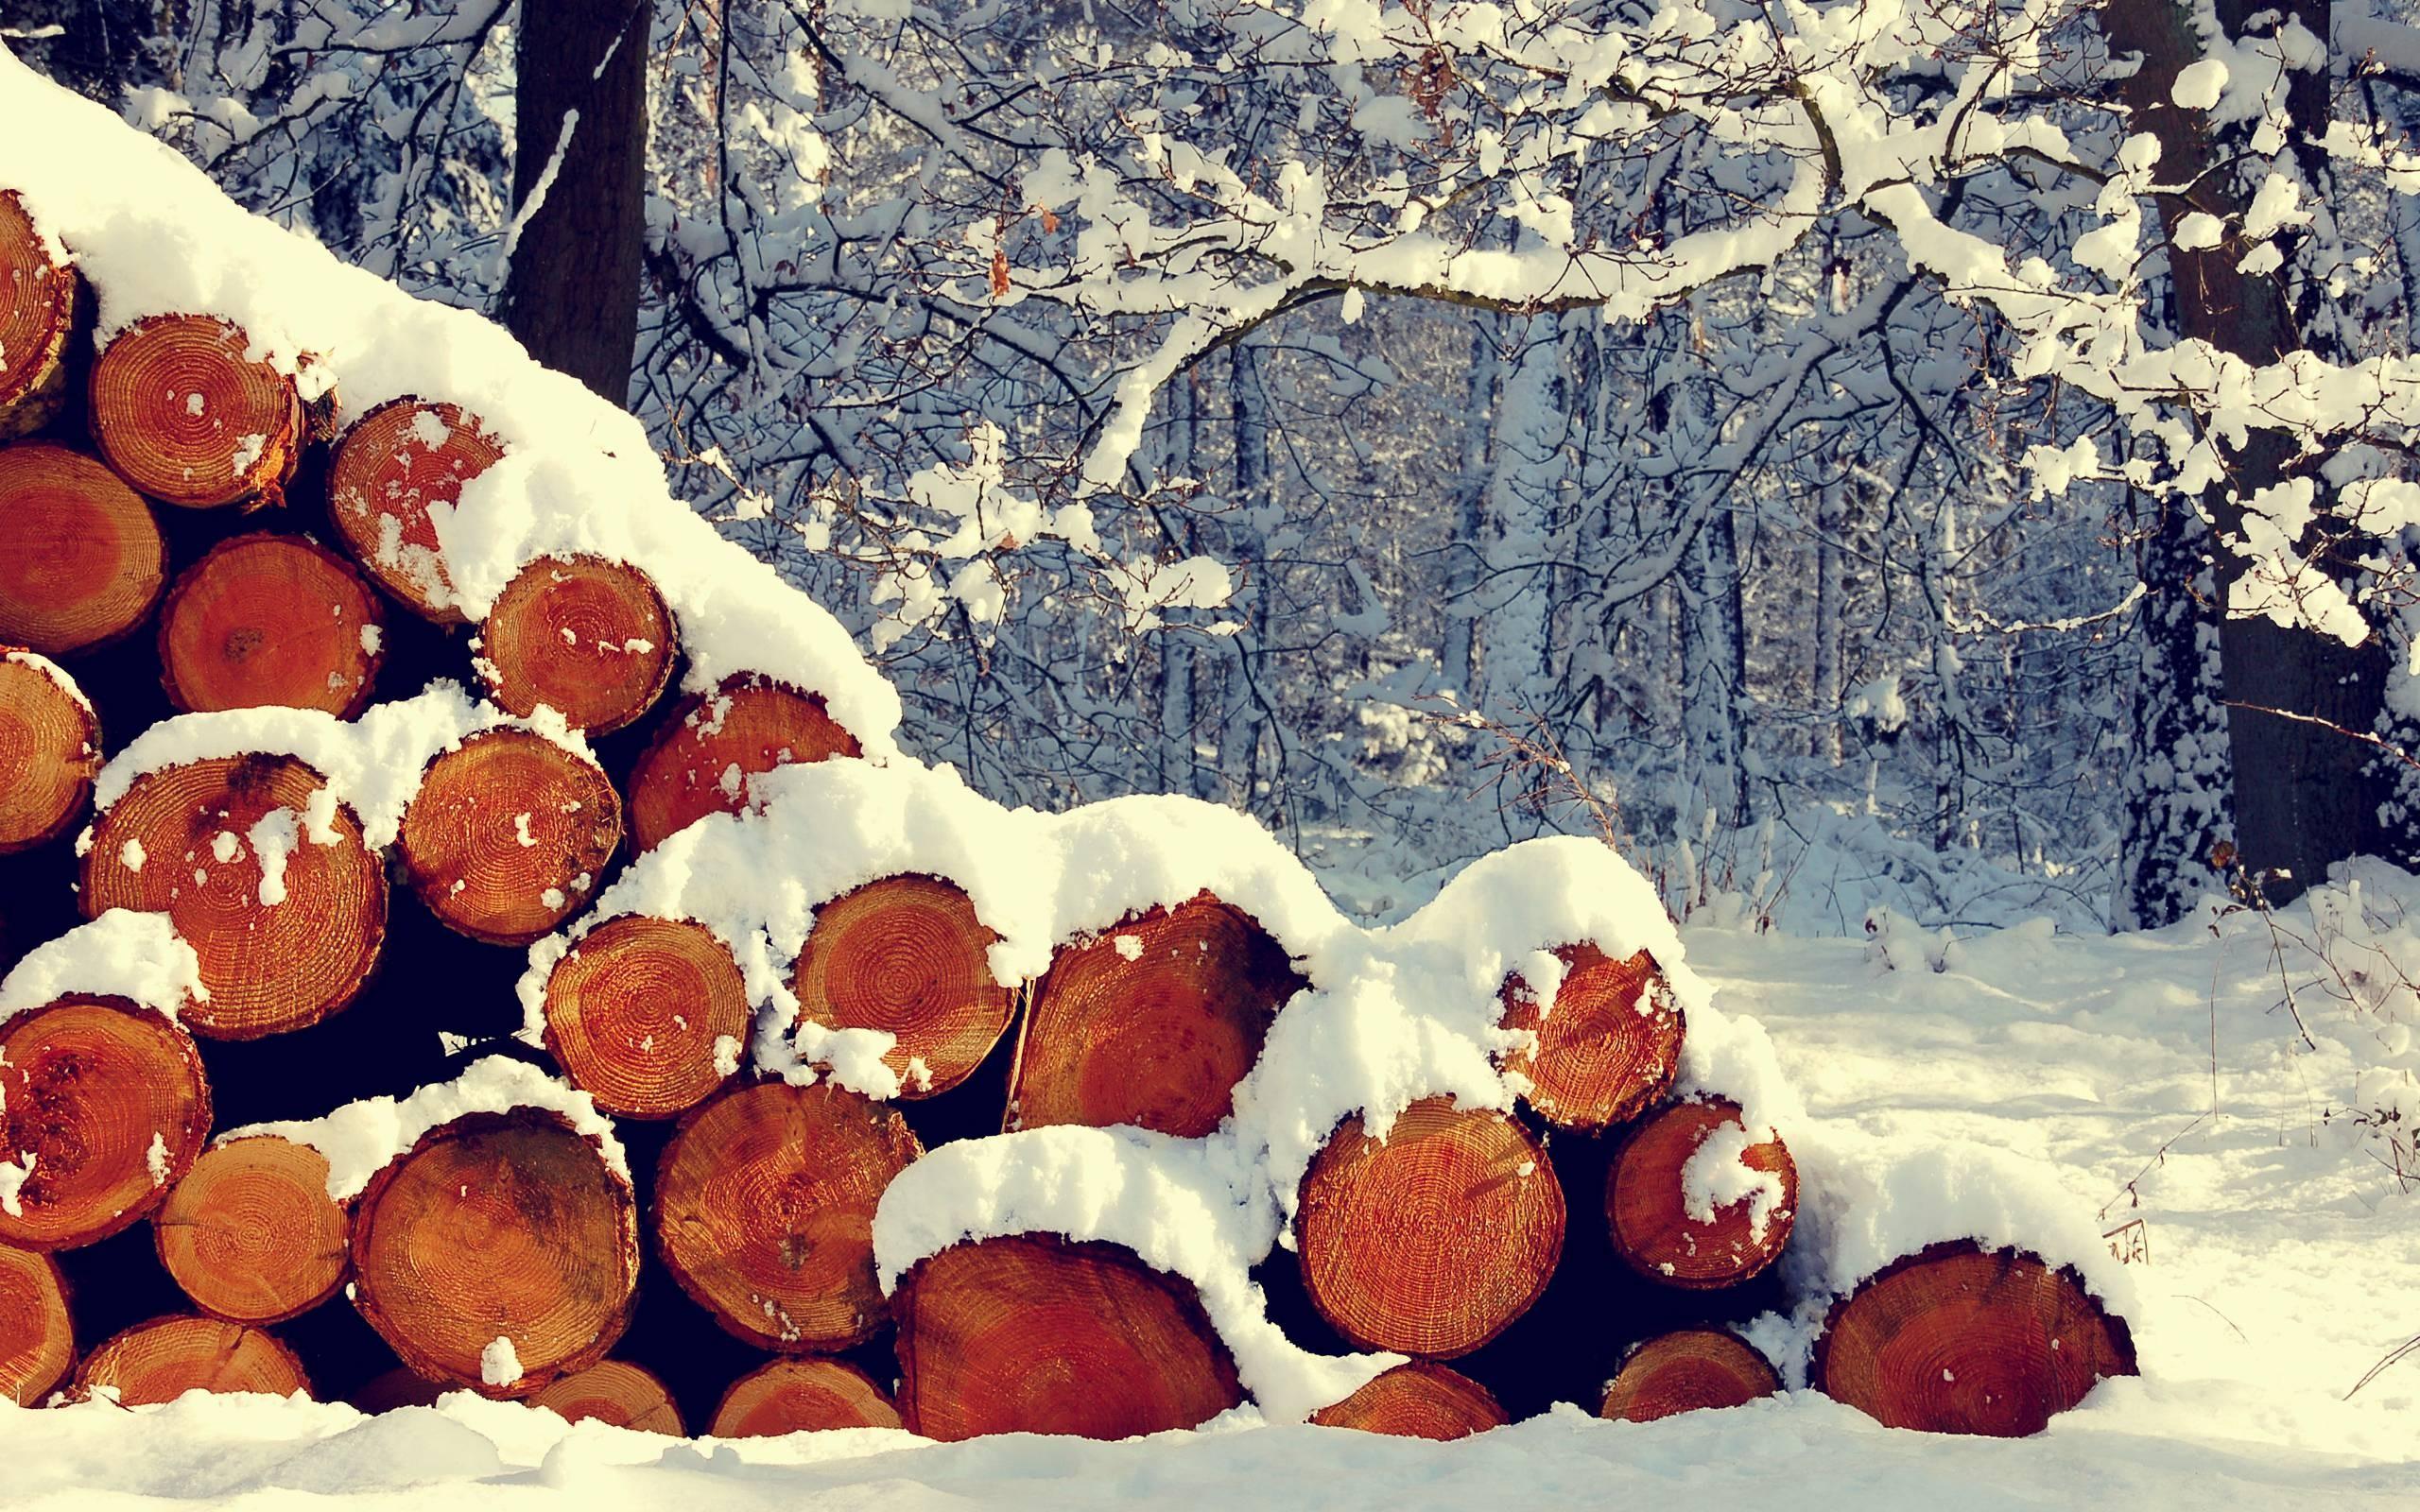 General 2560x1600 snow plants forest winter log metra